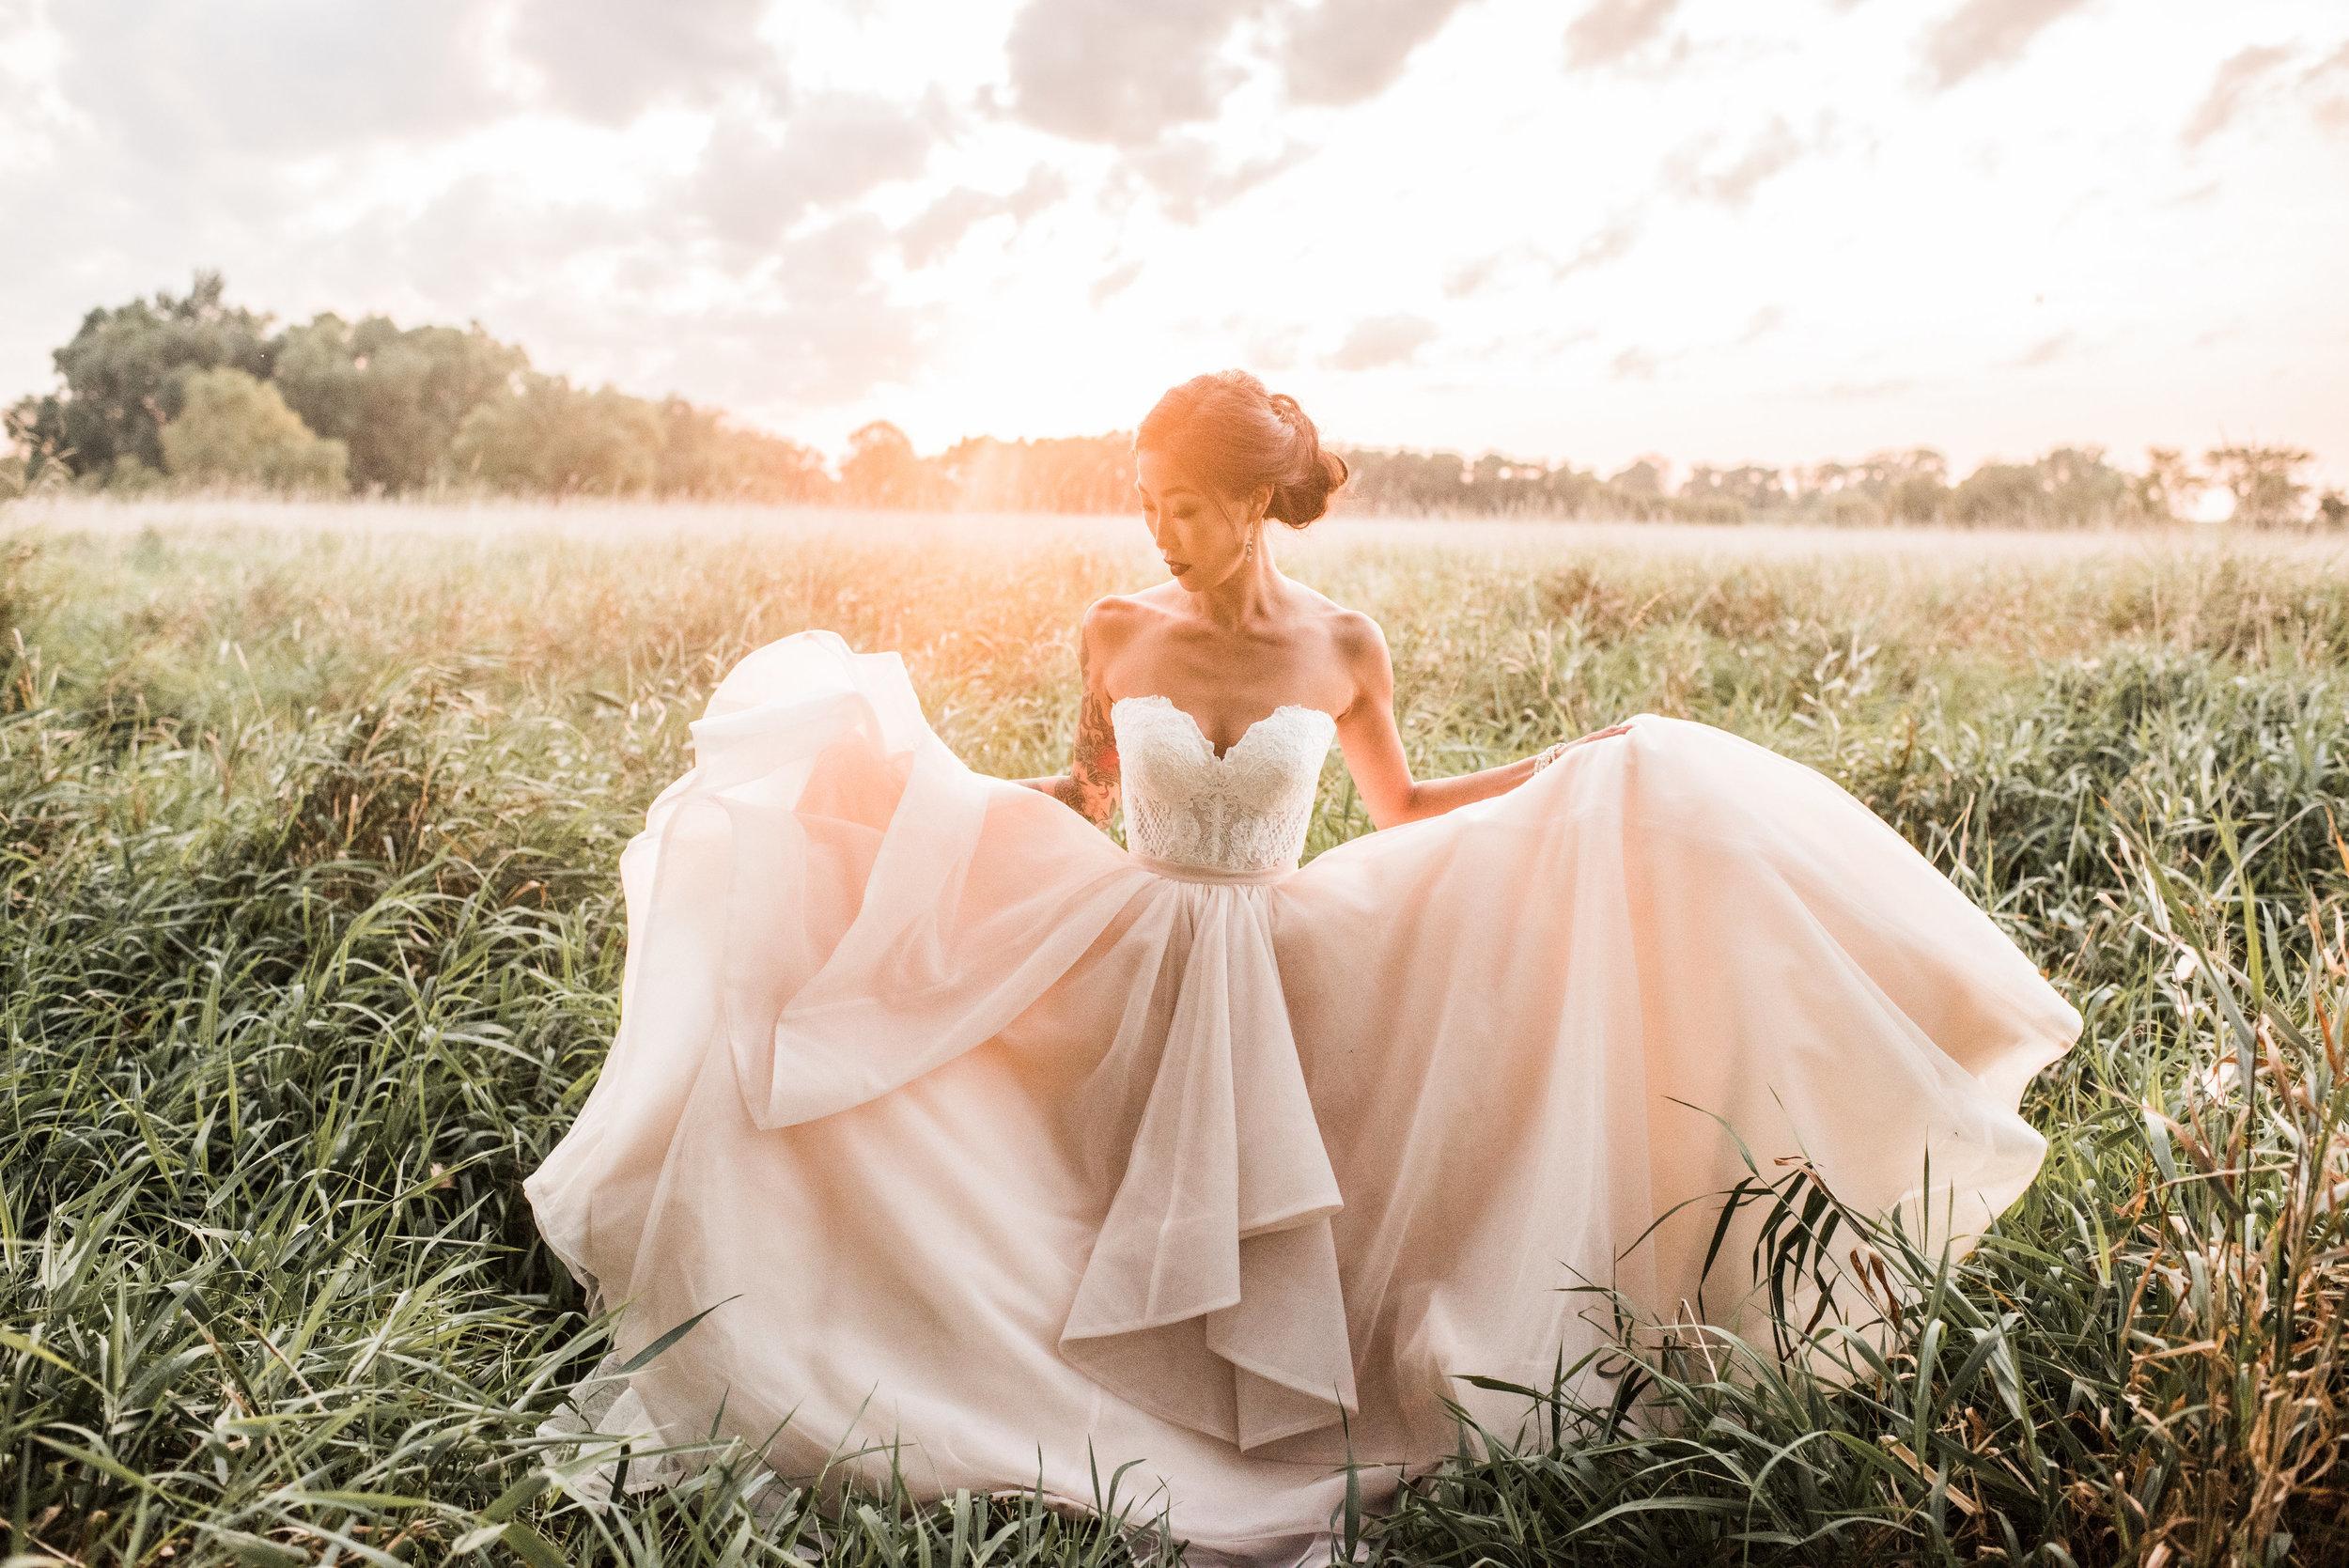 Photo: Captured Glory Photography